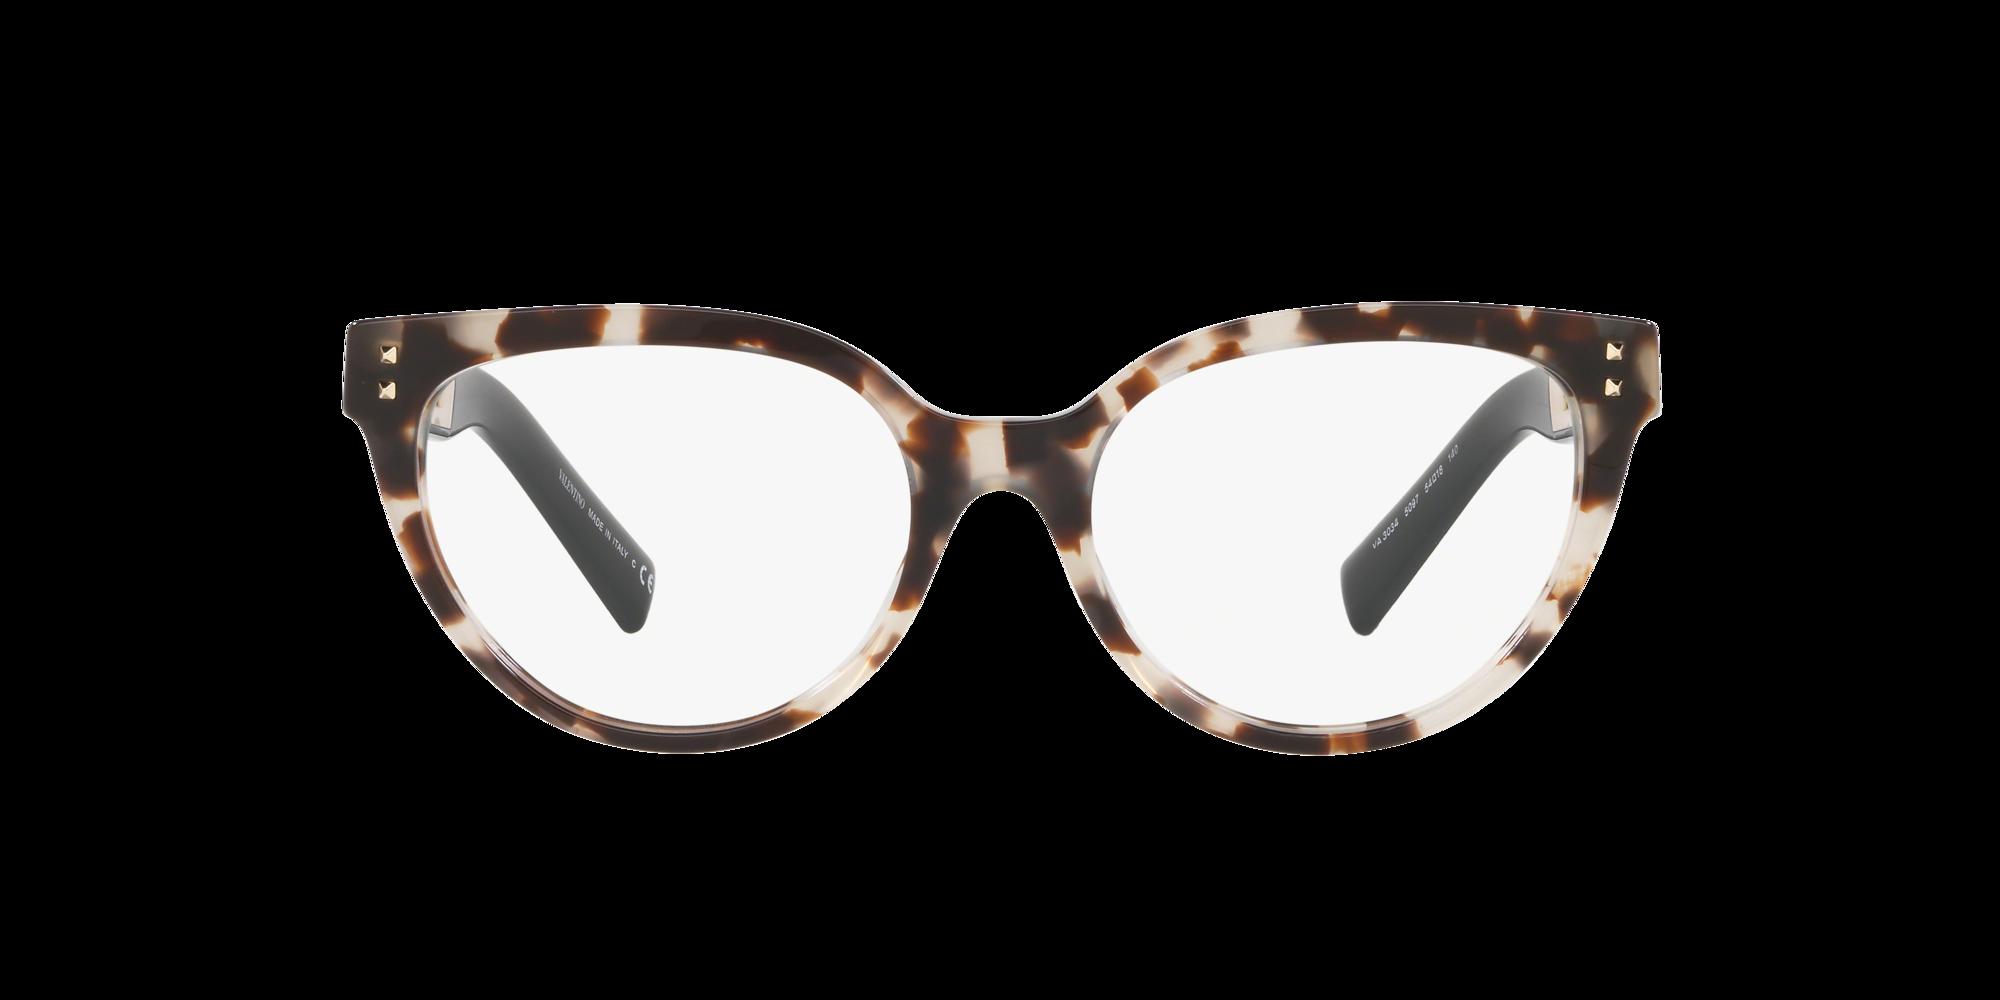 Image for VA3034 from LensCrafters | Glasses, Prescription Glasses Online, Eyewear